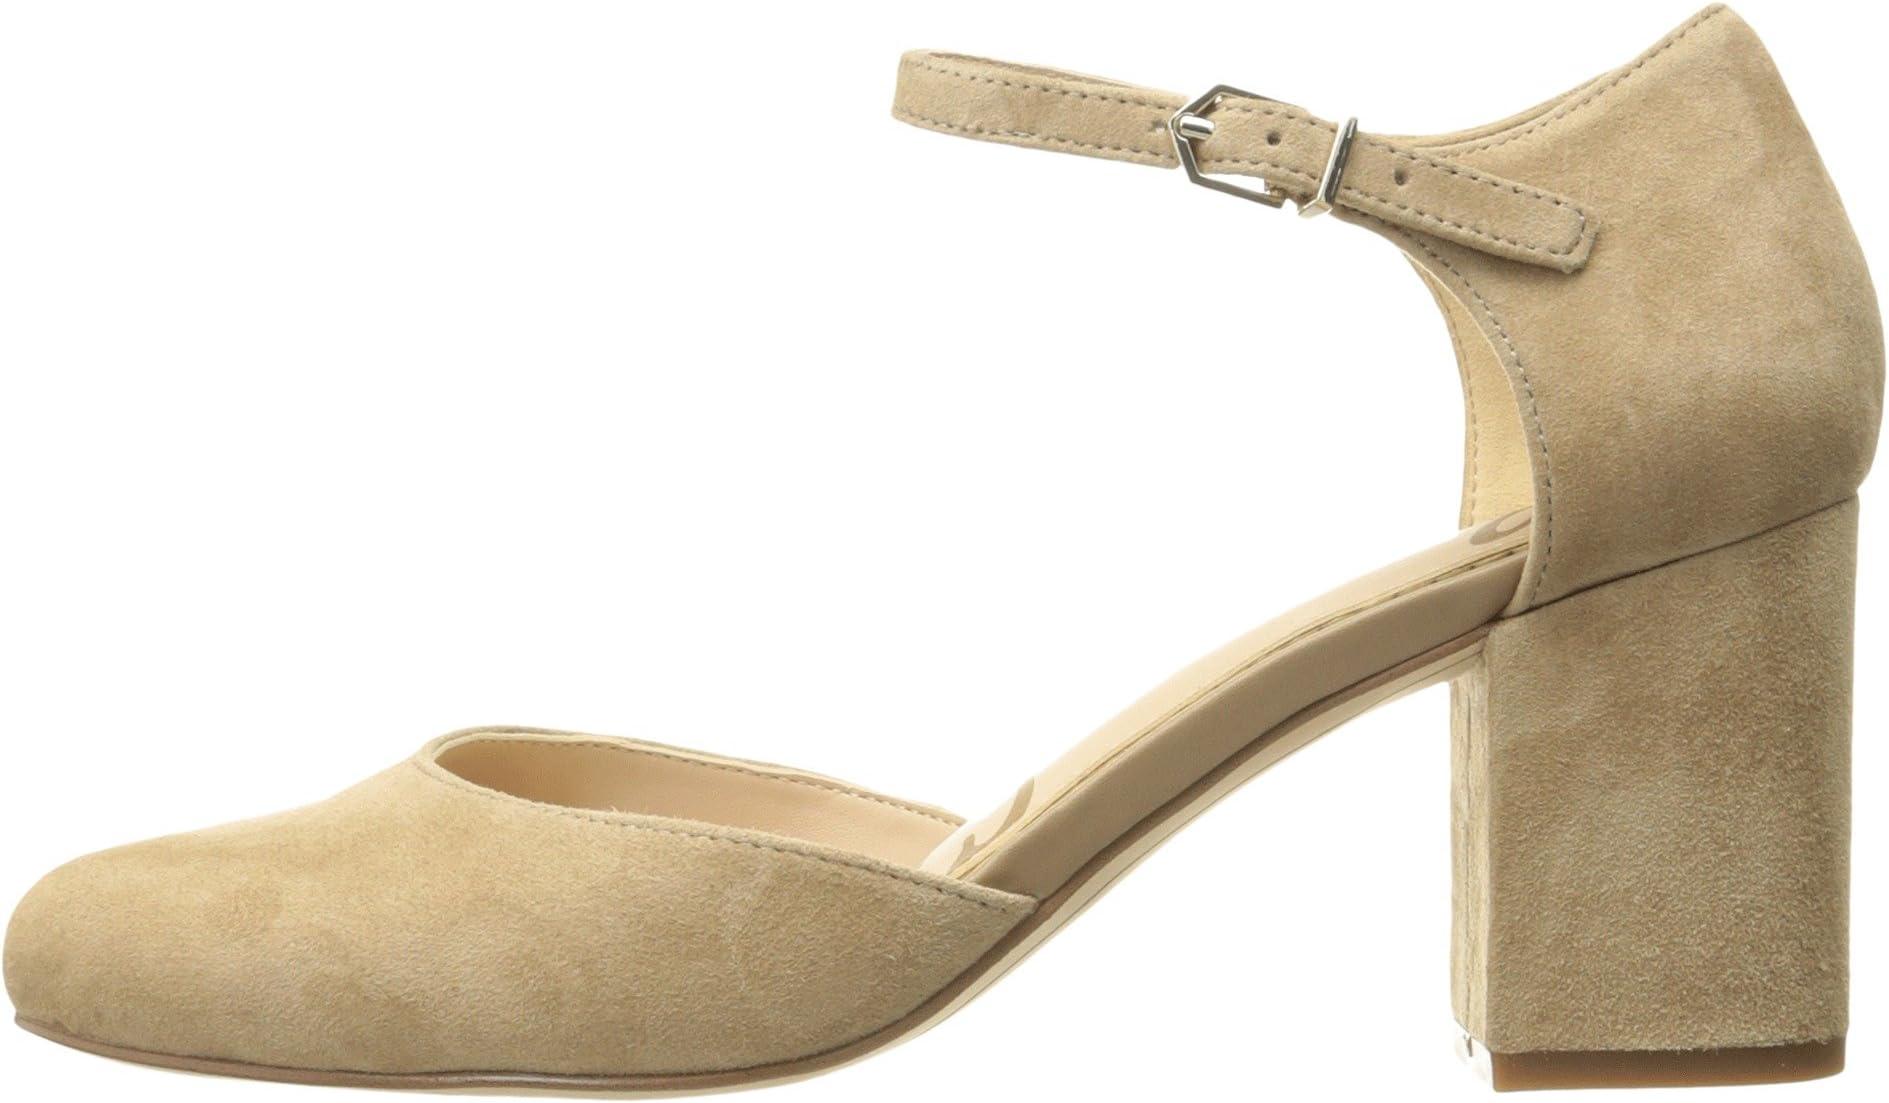 Sam Edelman Clover | Women's shoes | 2020 Newest